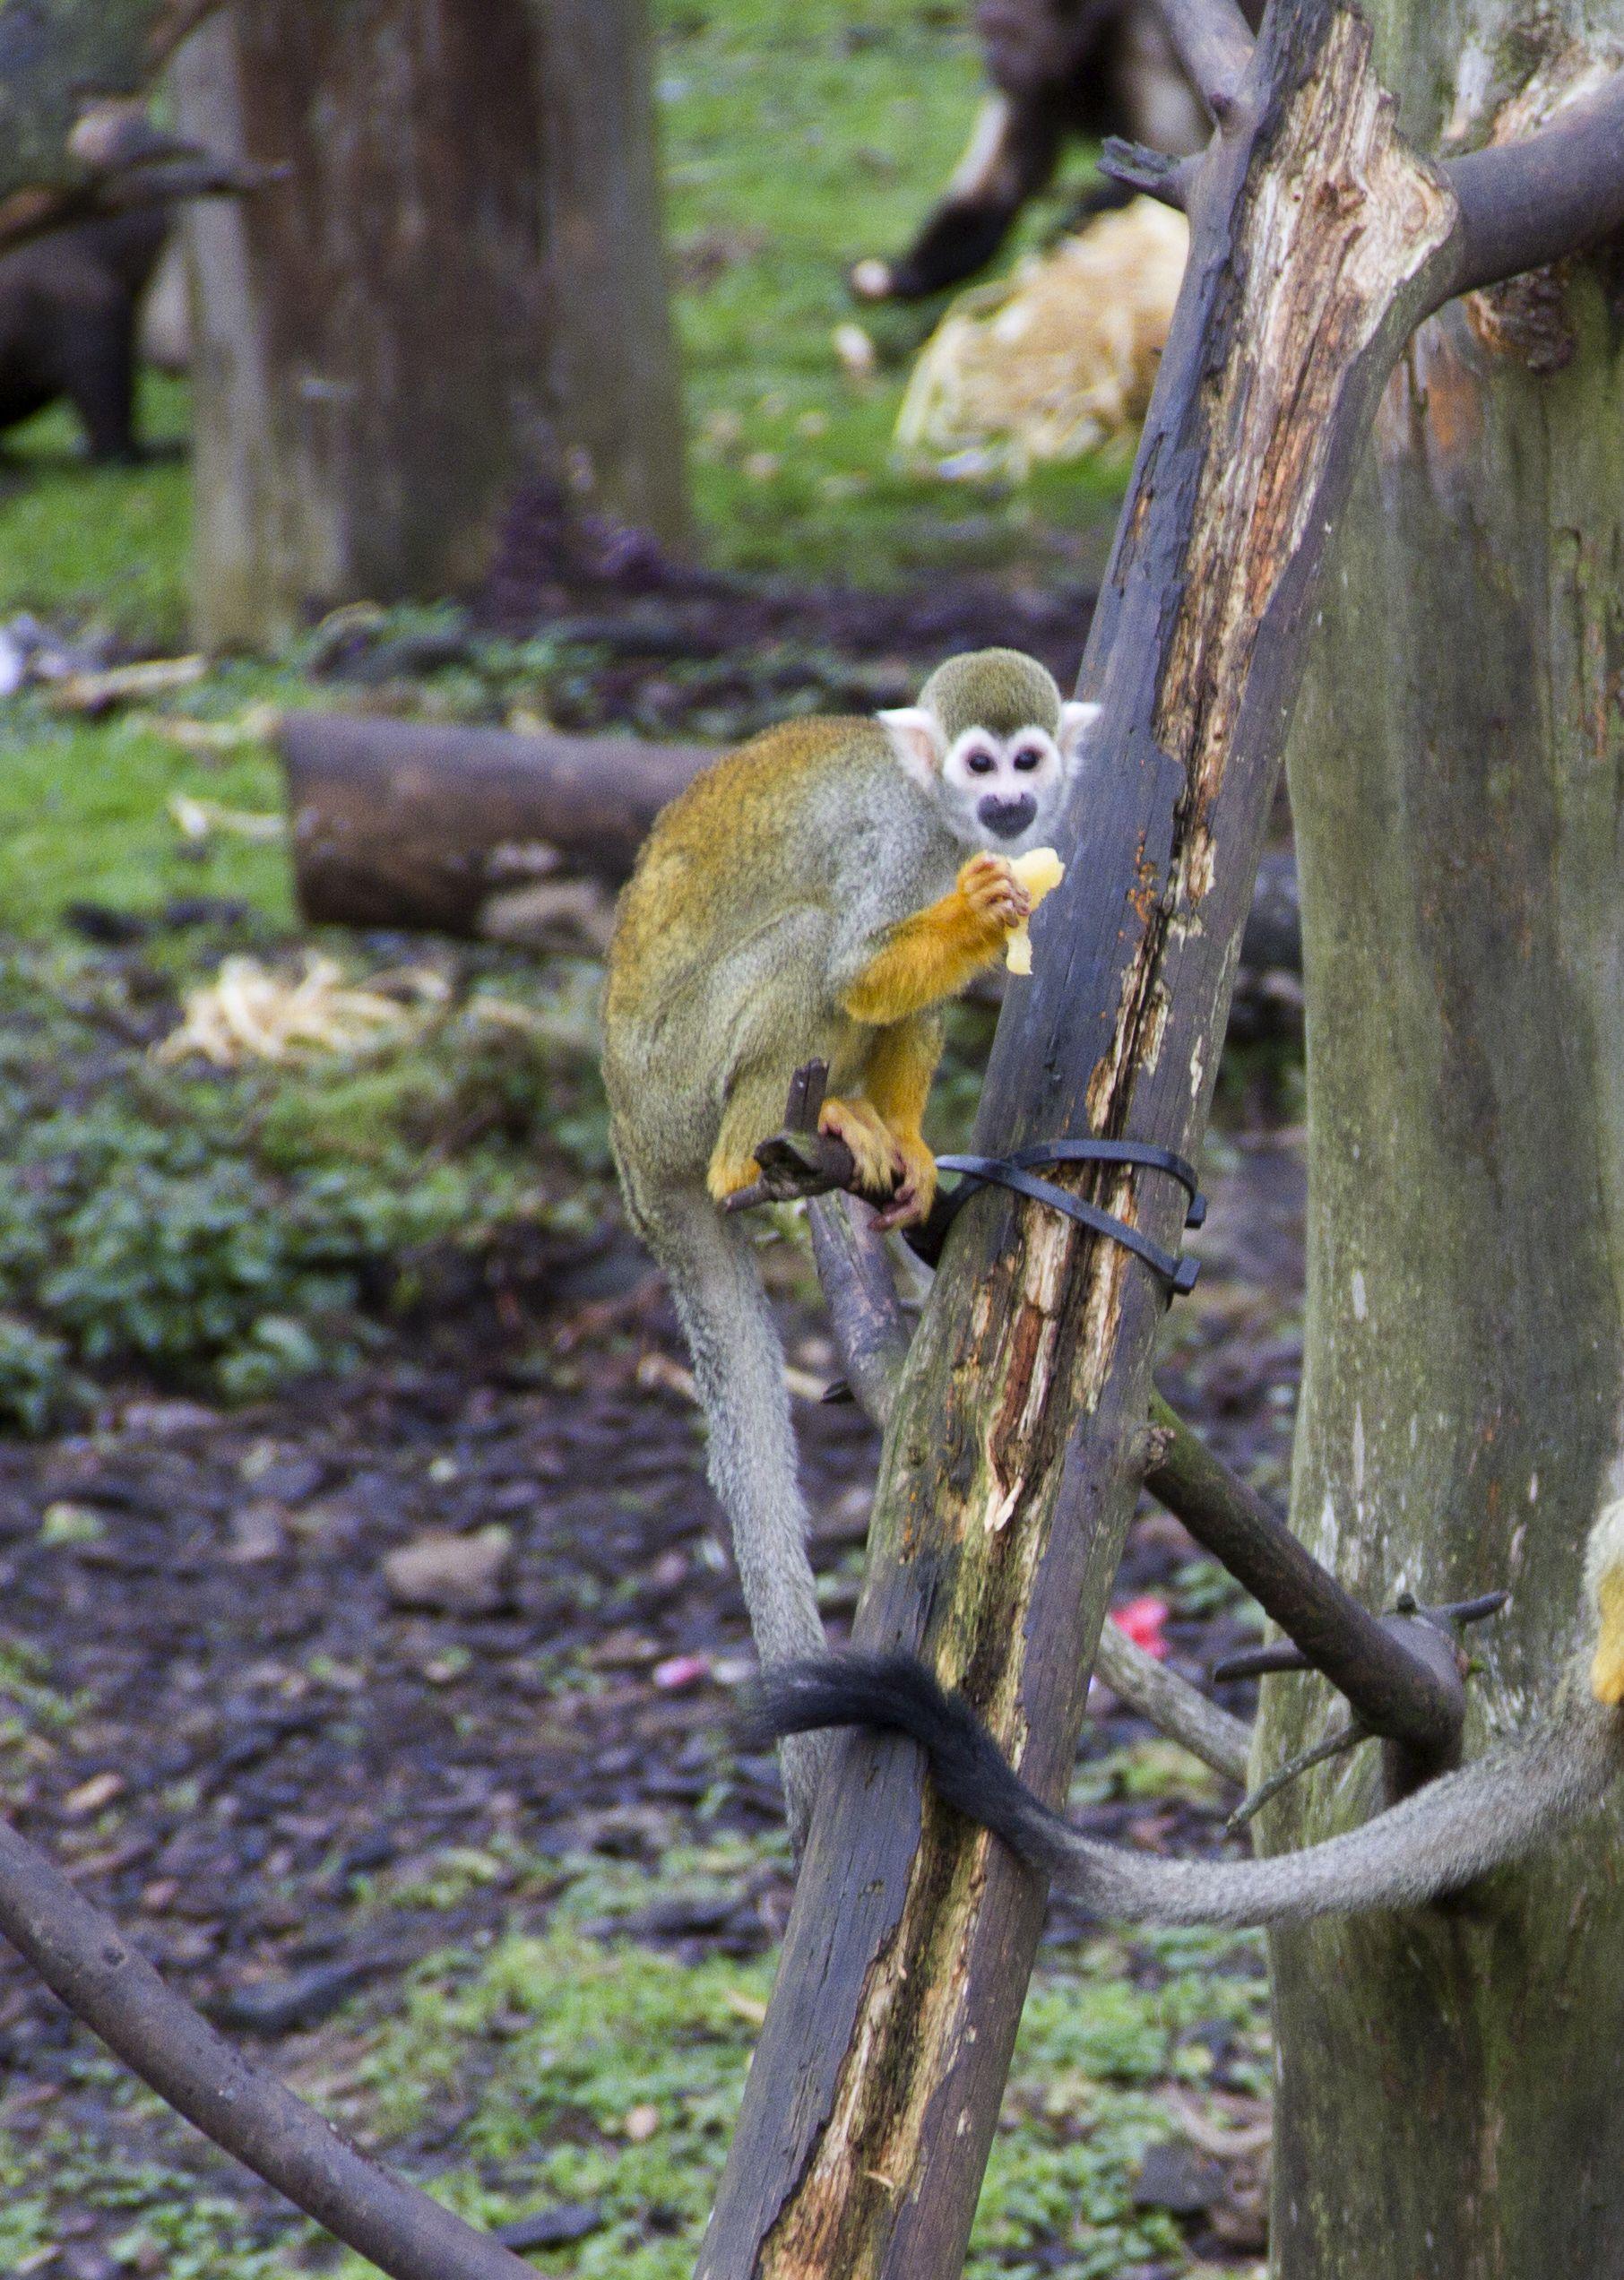 Common Squirrel Monkey Squirrel Monkey Pet Birds Zoo Animals